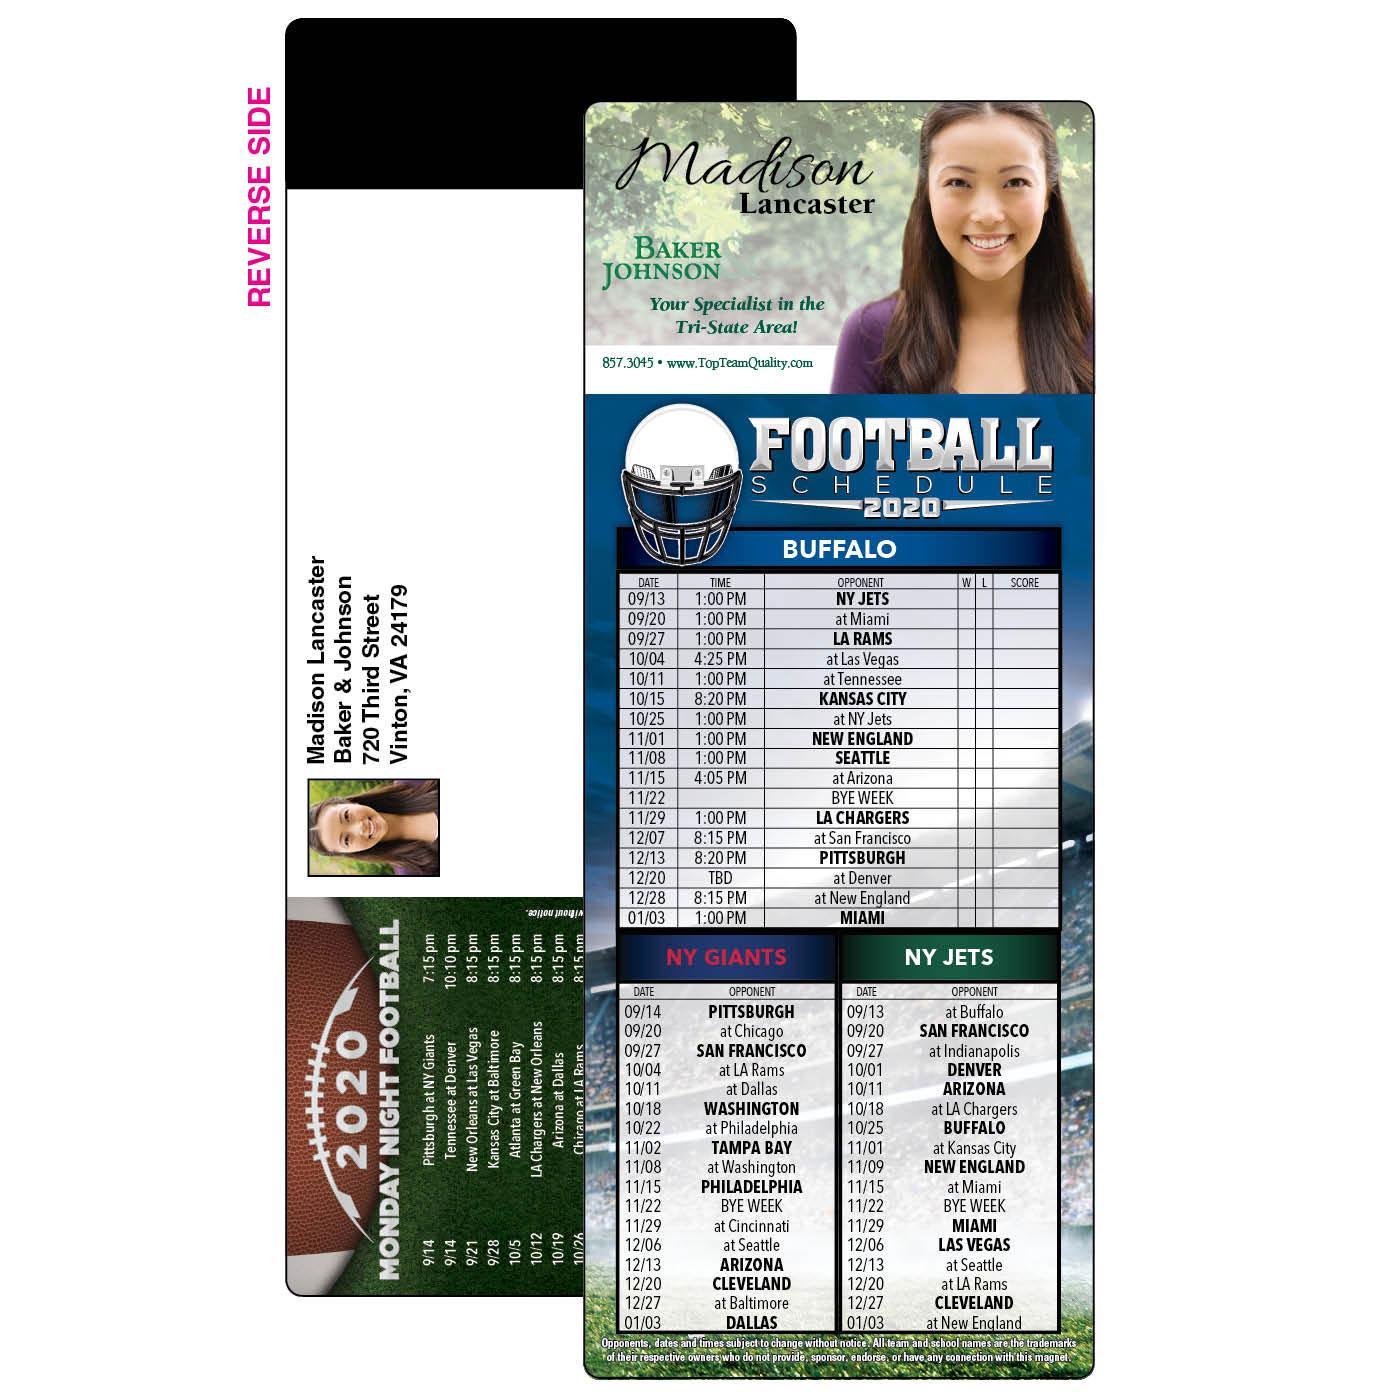 Football Schedule Self-Mailer